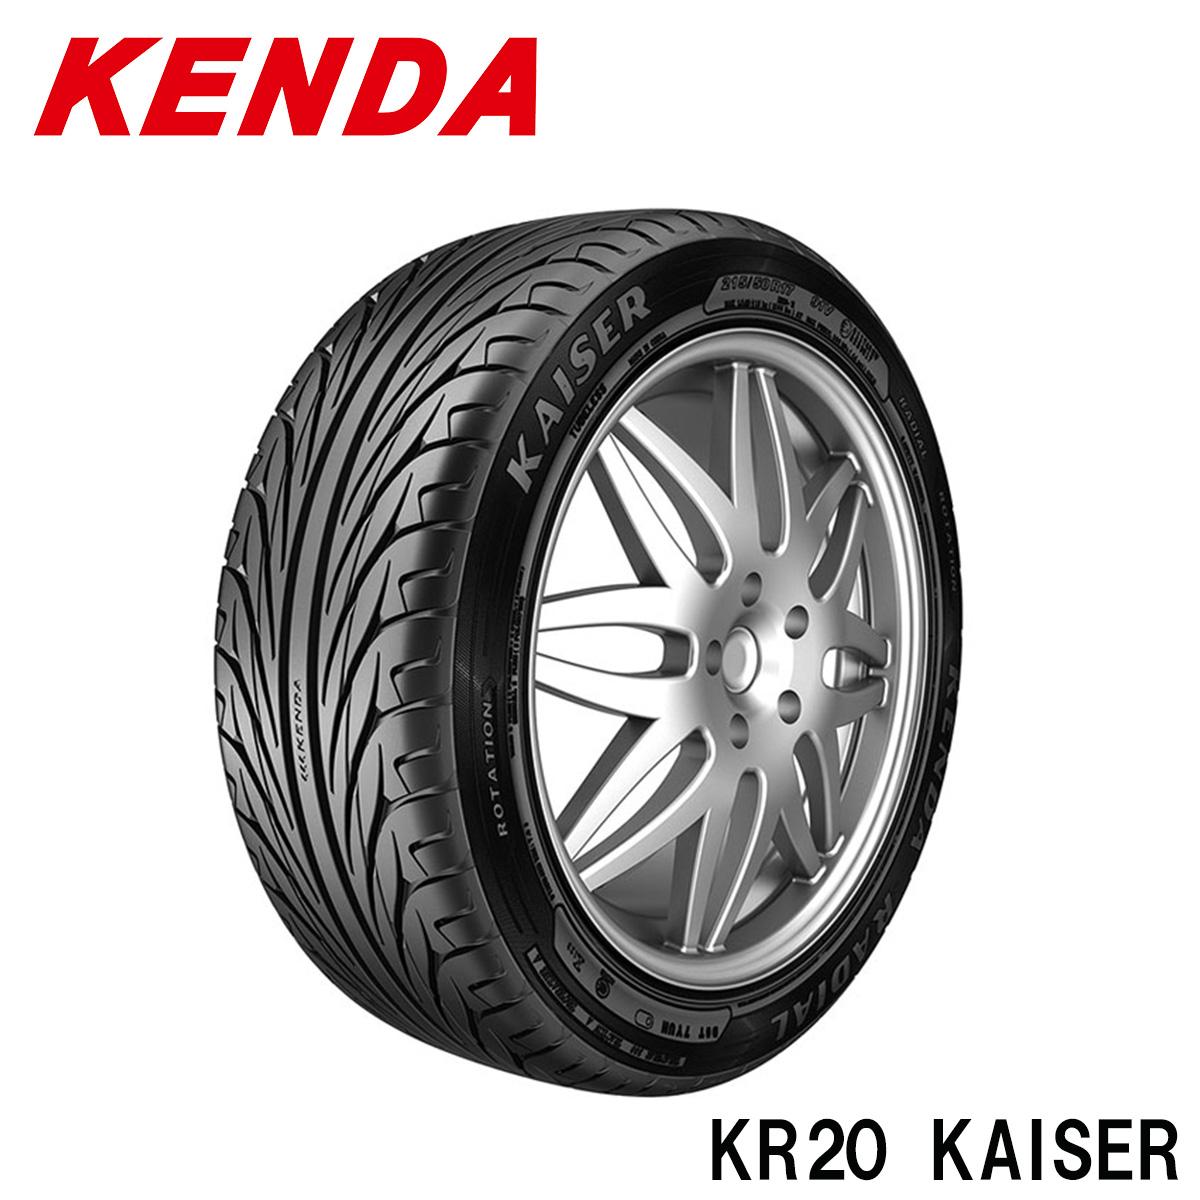 KENDA ケンダ ケンダ サマータイヤ 215/45R17 2本 17インチ 215/45R17 KENDA カイザー KAISER KR20, 【SEAL限定商品】:9e2d8224 --- officewill.xsrv.jp